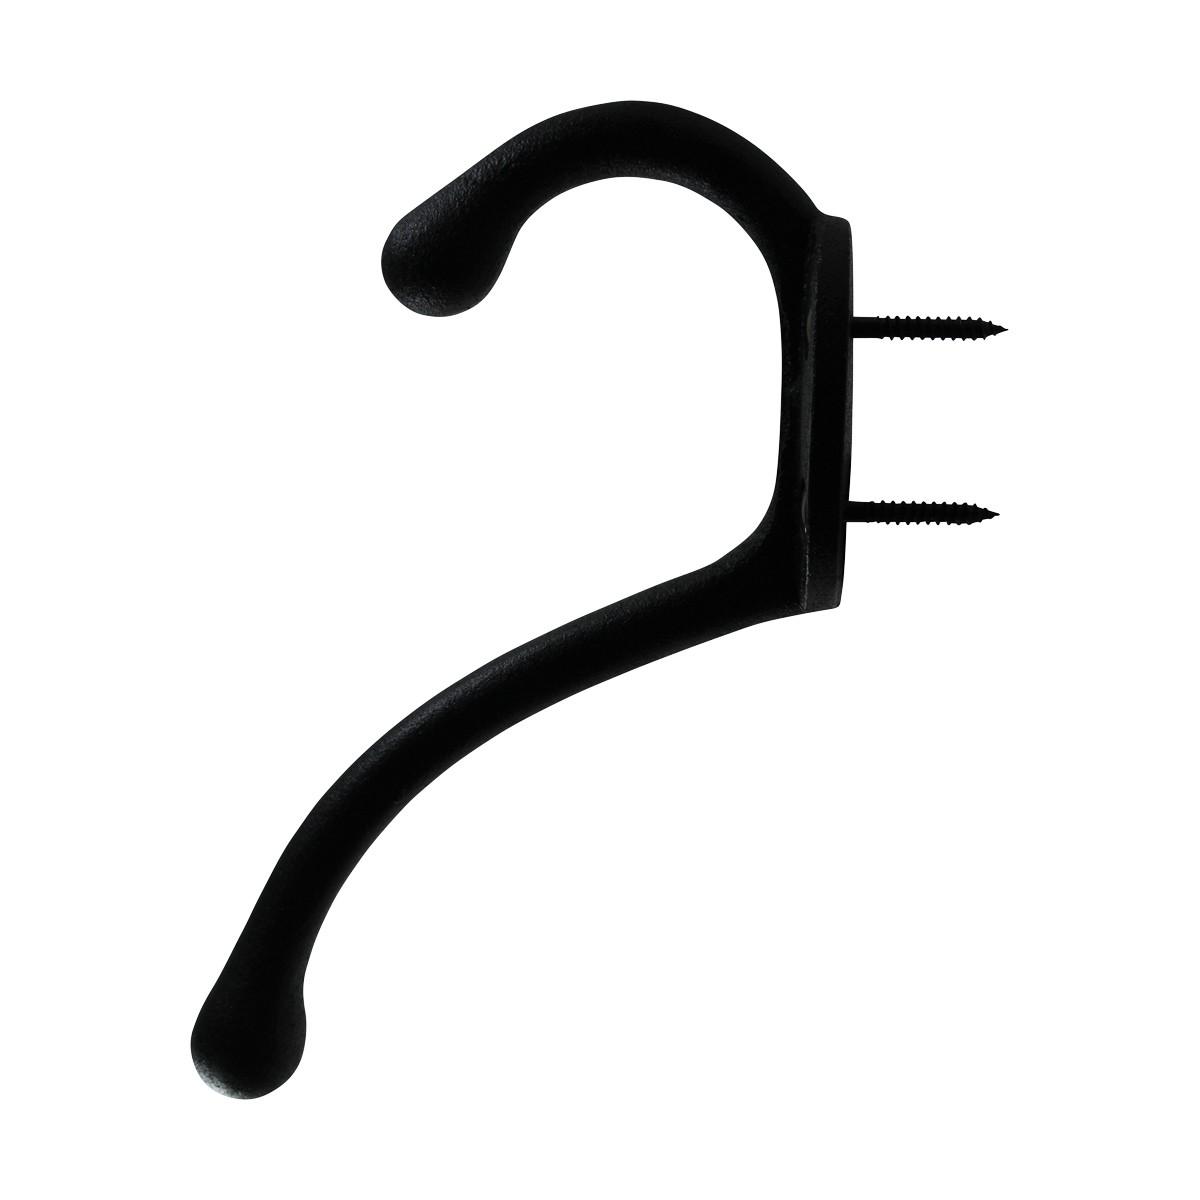 10 Hook Wrought Iron Black Cast RSF 5 12H X 3 34 Proj Hooks Decorative Hook Coat Hook